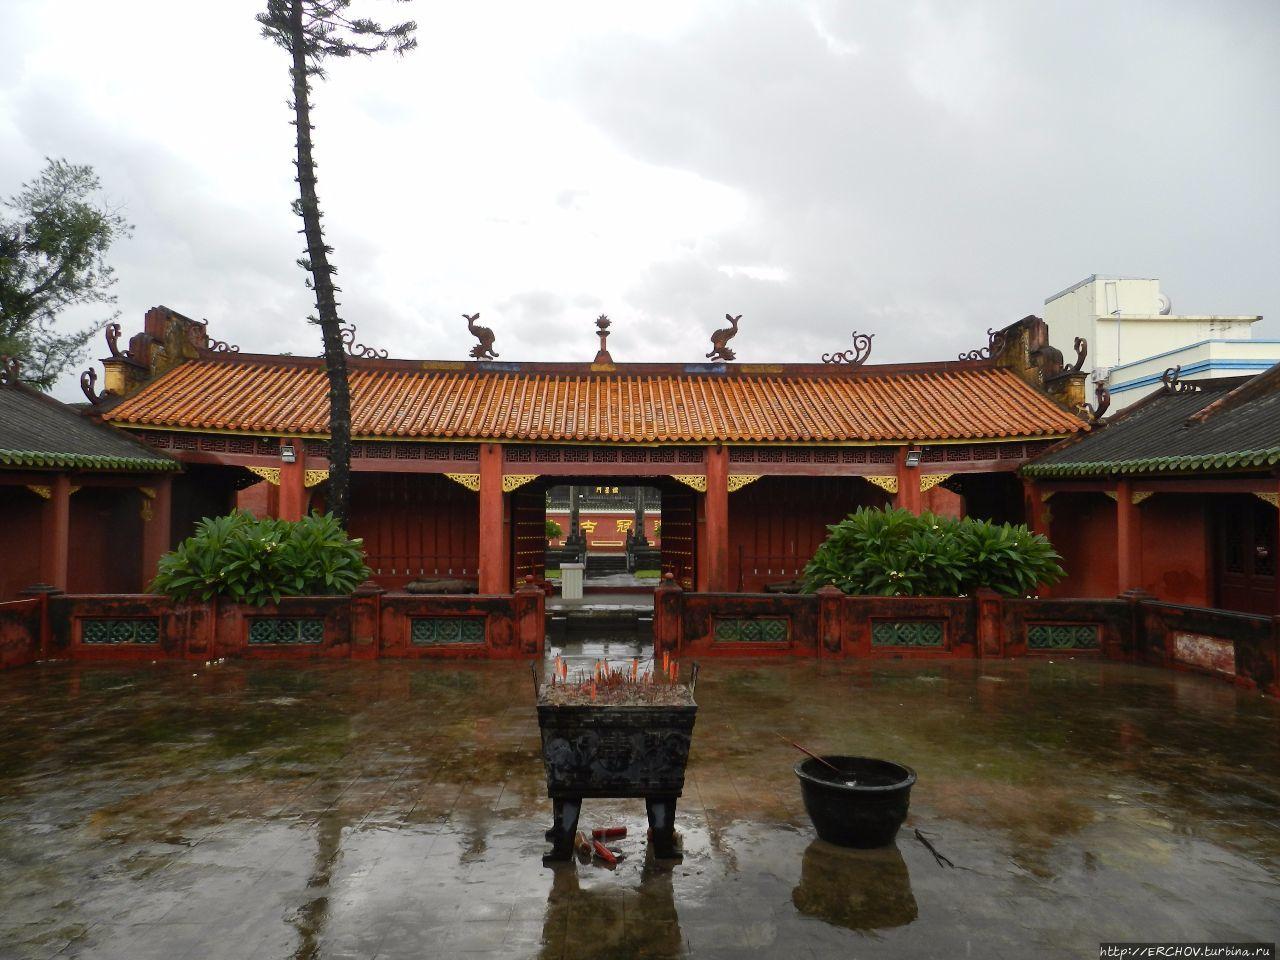 Бассейн отеля crowne plaza sanya (yalong bay) санья остров хайнань китай